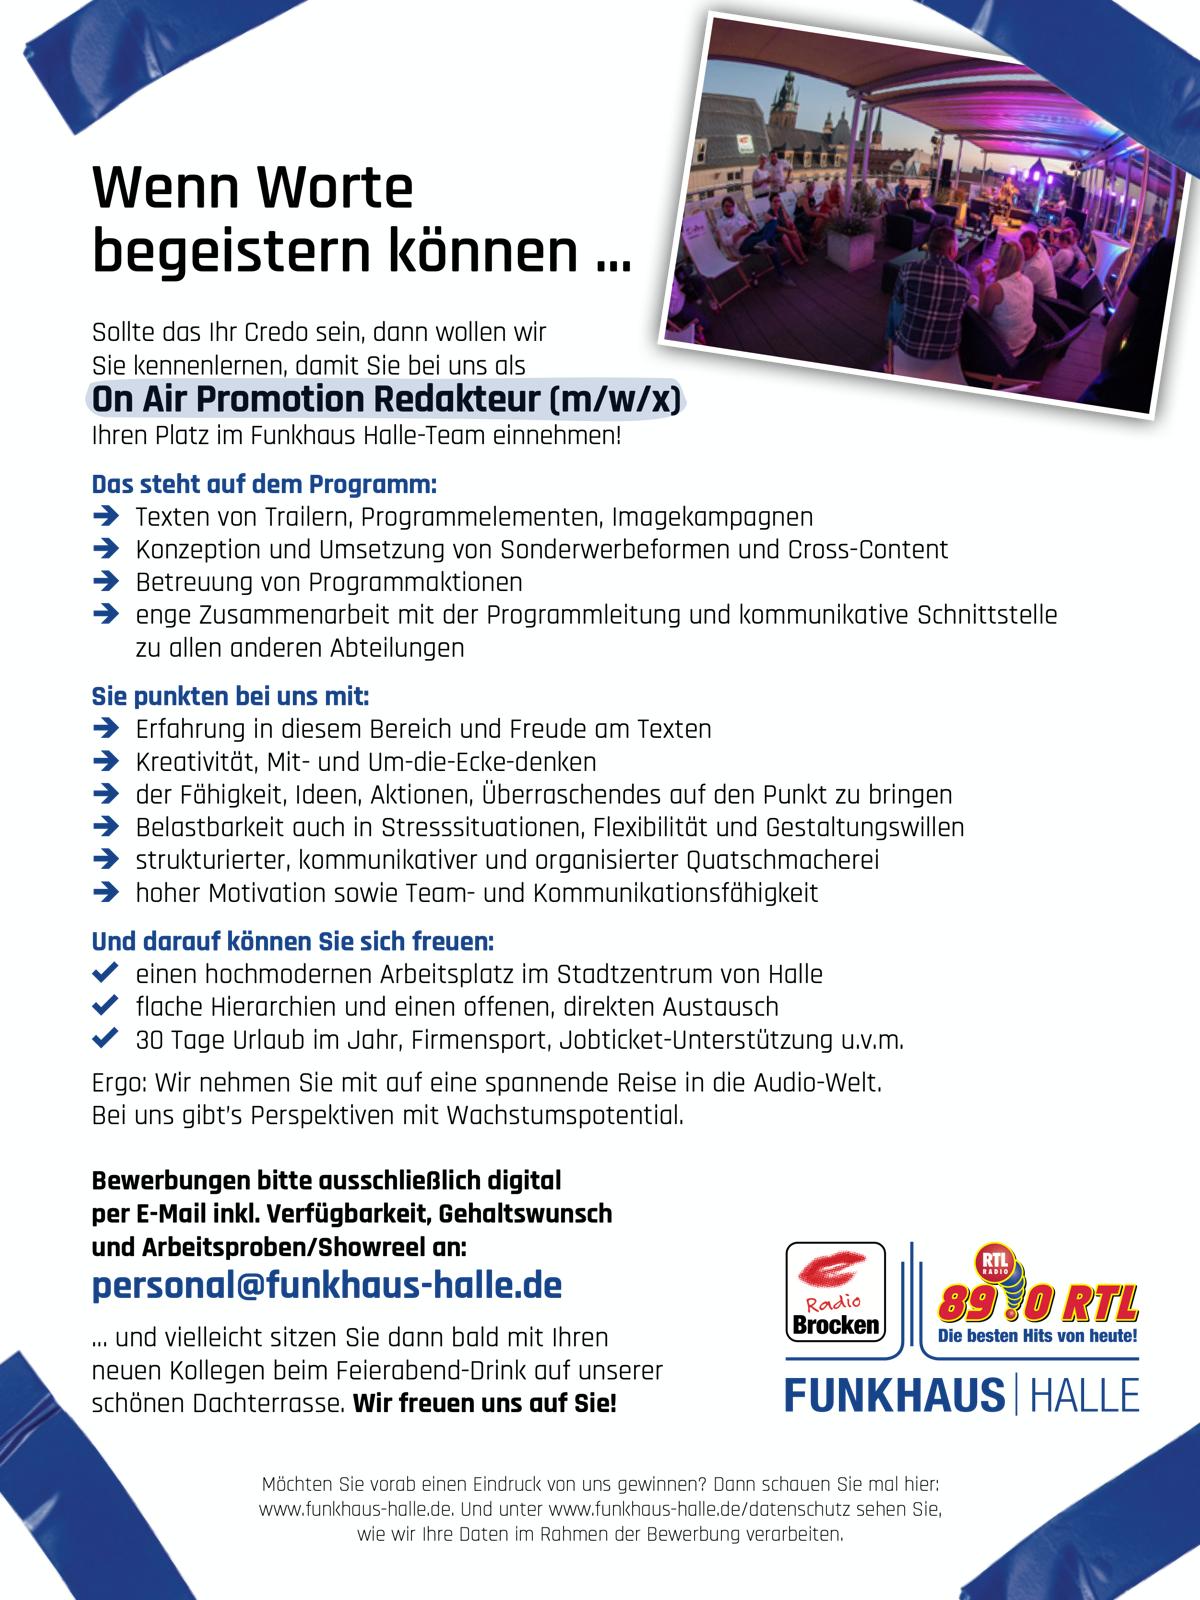 Funkhaus Halle sucht On Air Promotion Redakteur (m/w/x)